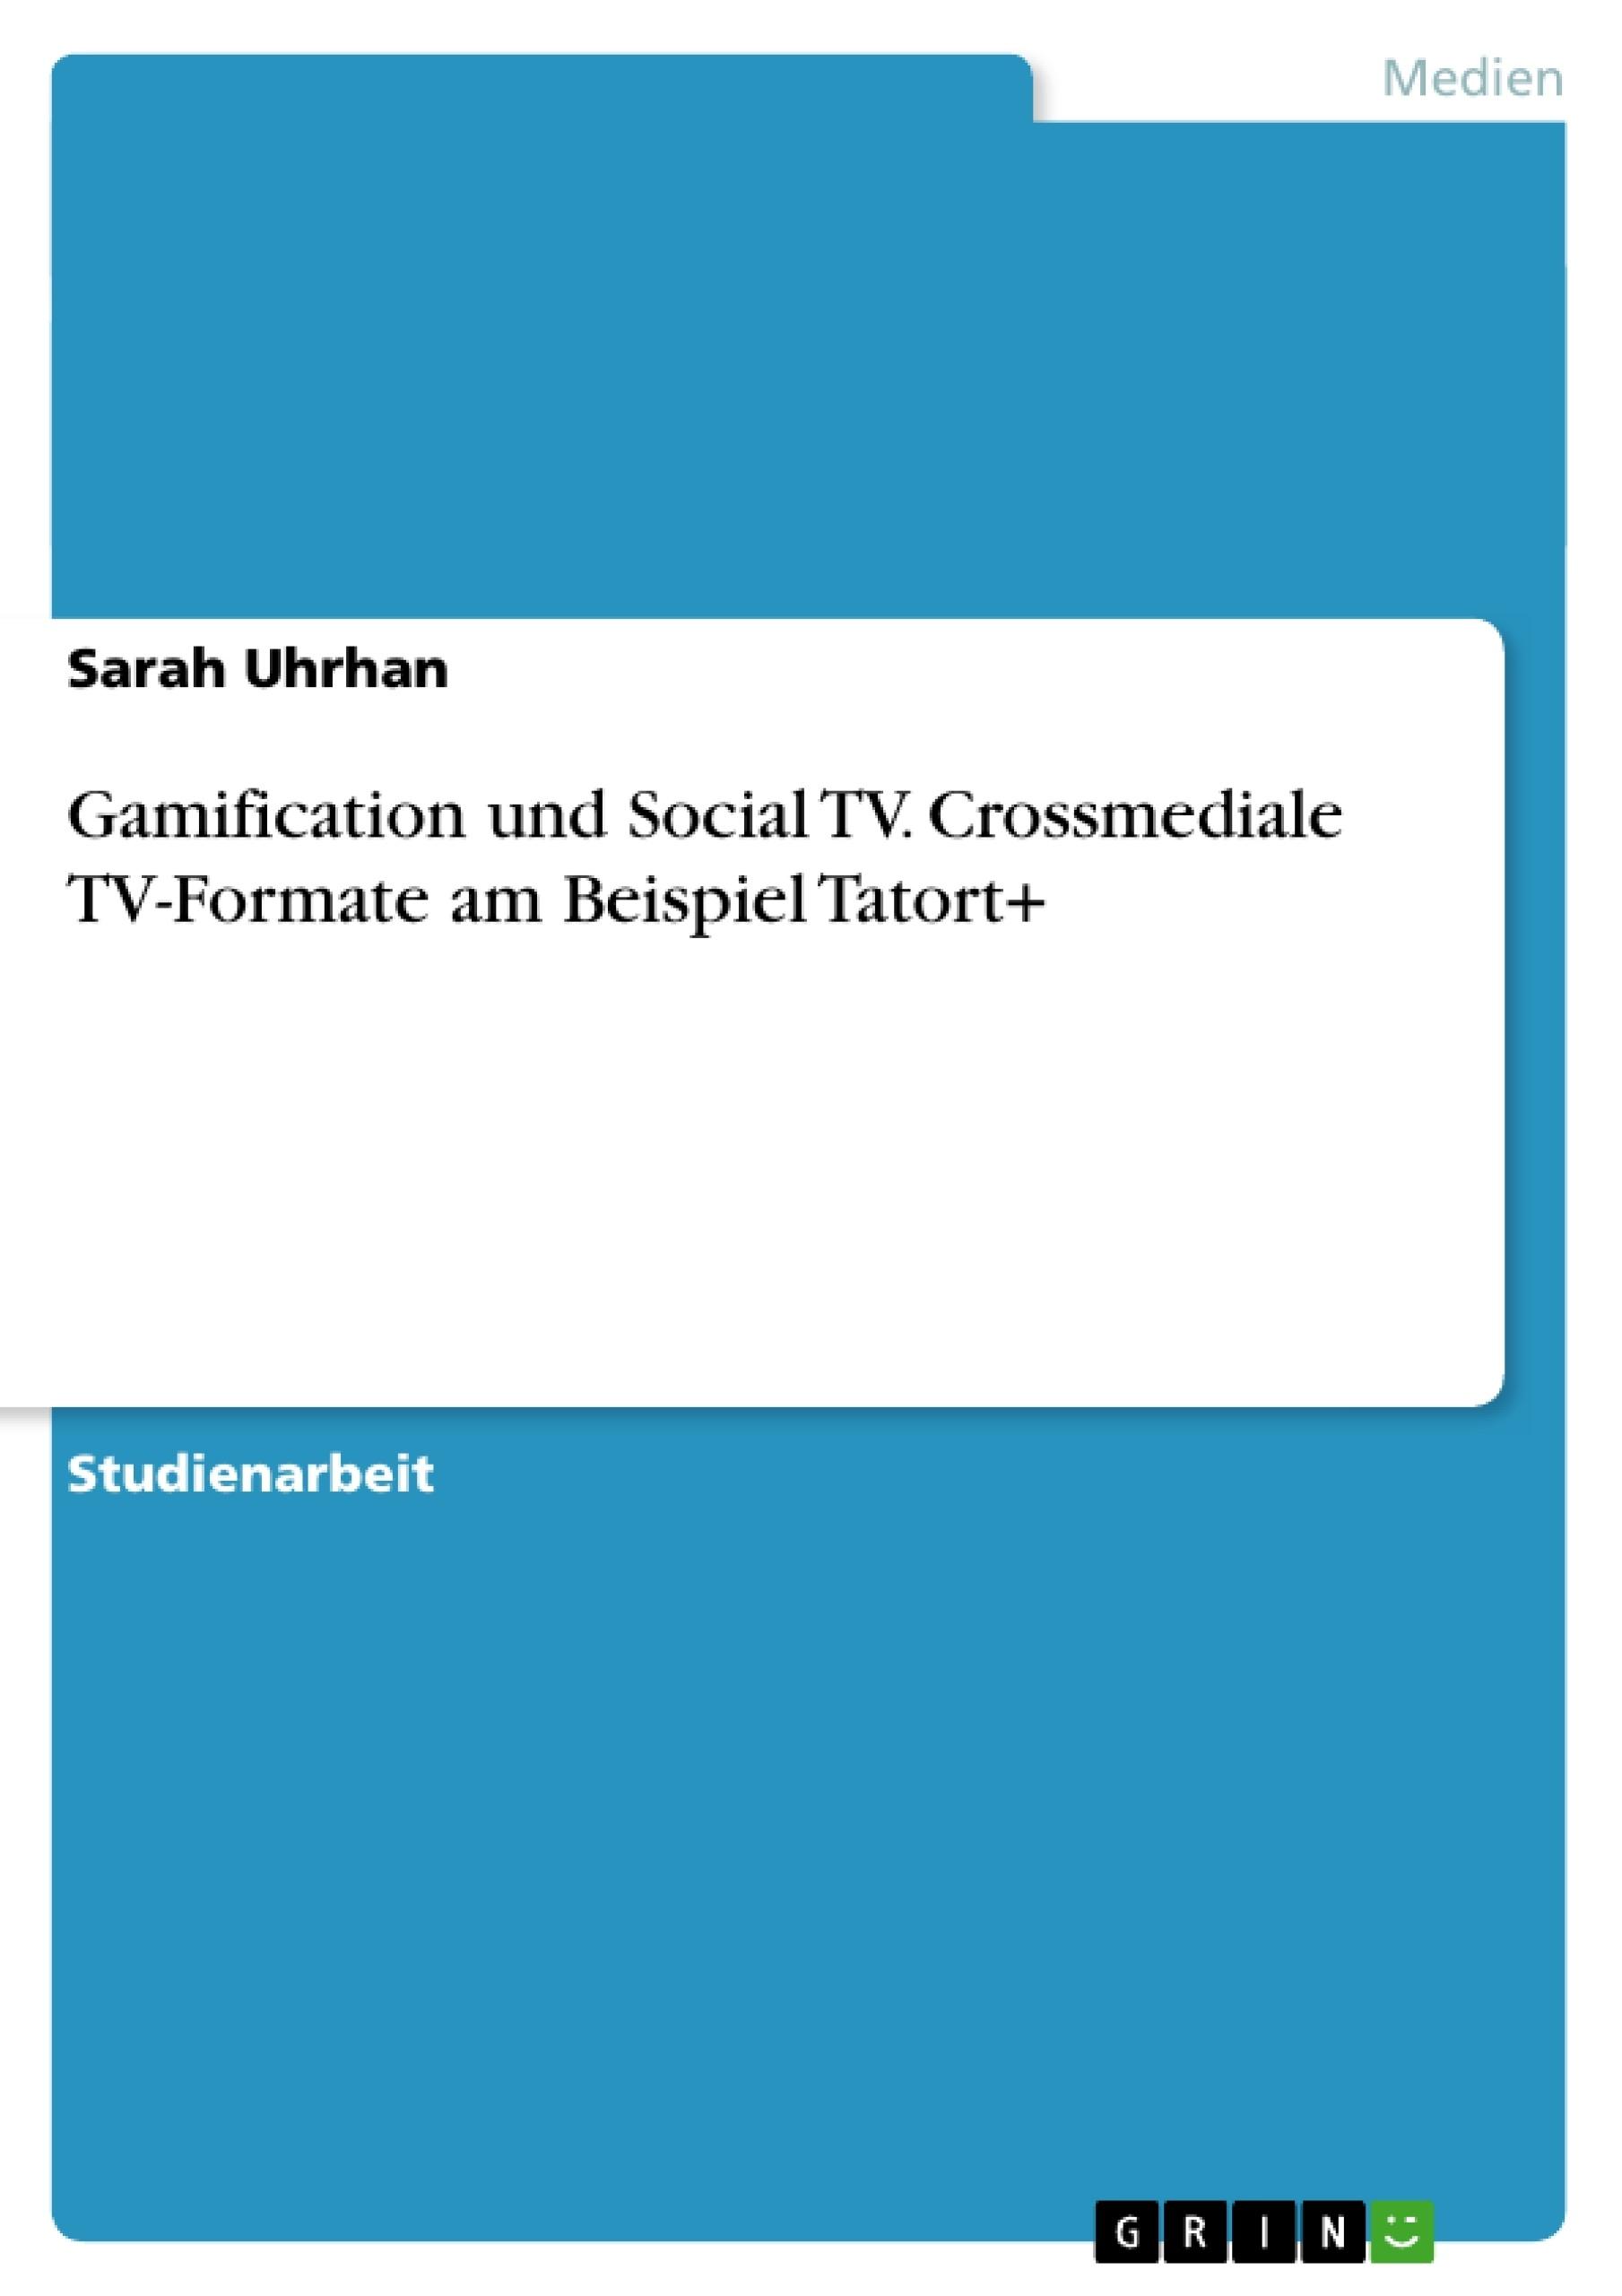 Titel: Gamification und Social TV. Crossmediale TV-Formate am Beispiel Tatort+